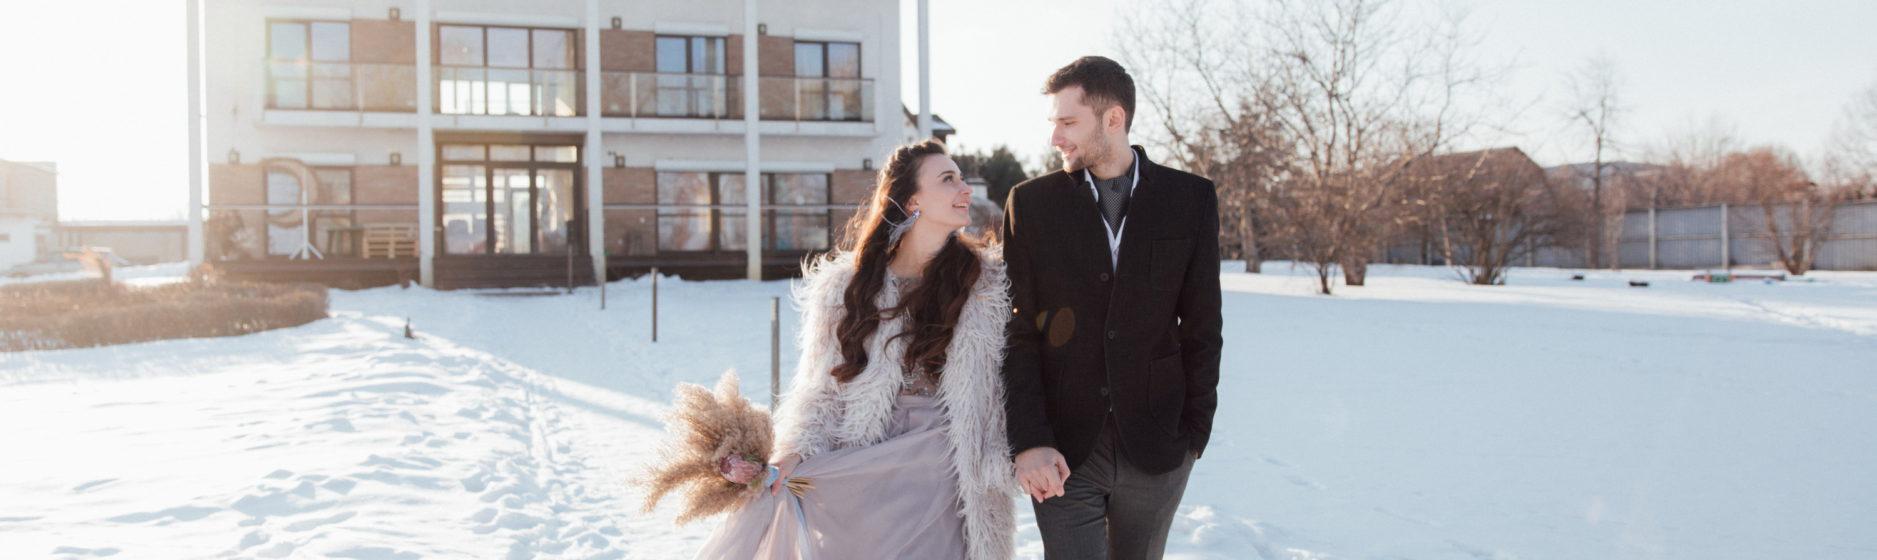 Между нами: зимняя свадьба